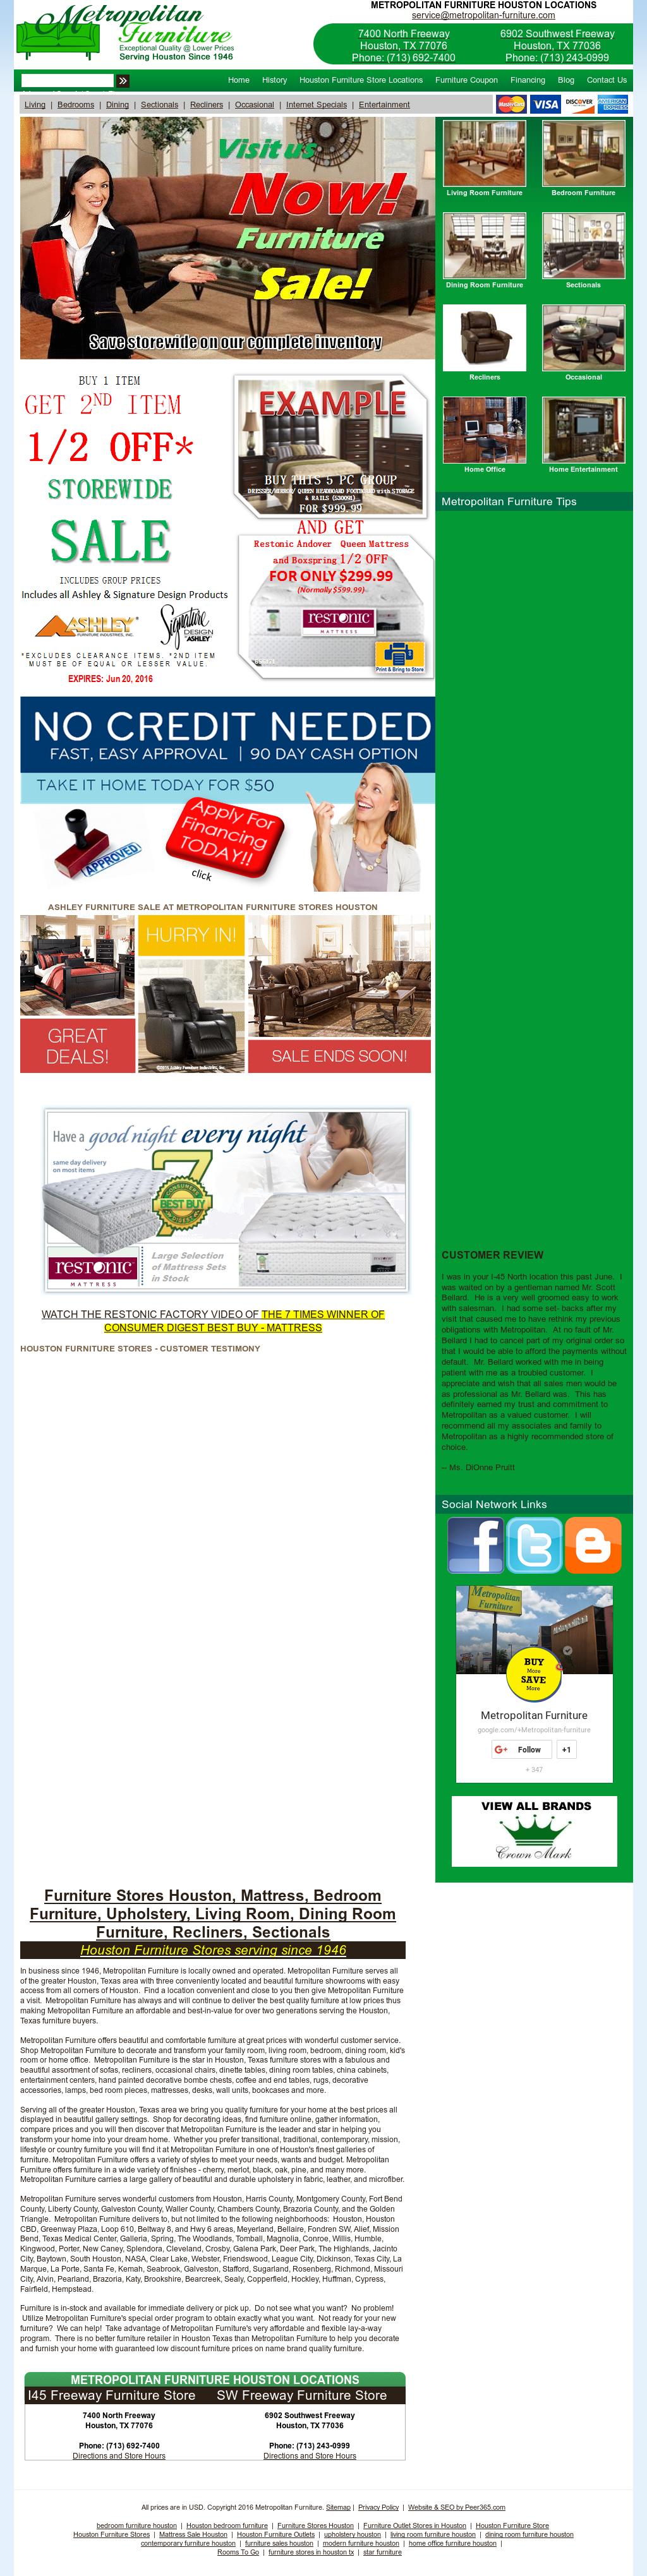 Bon Metropolitan Furniture Website History